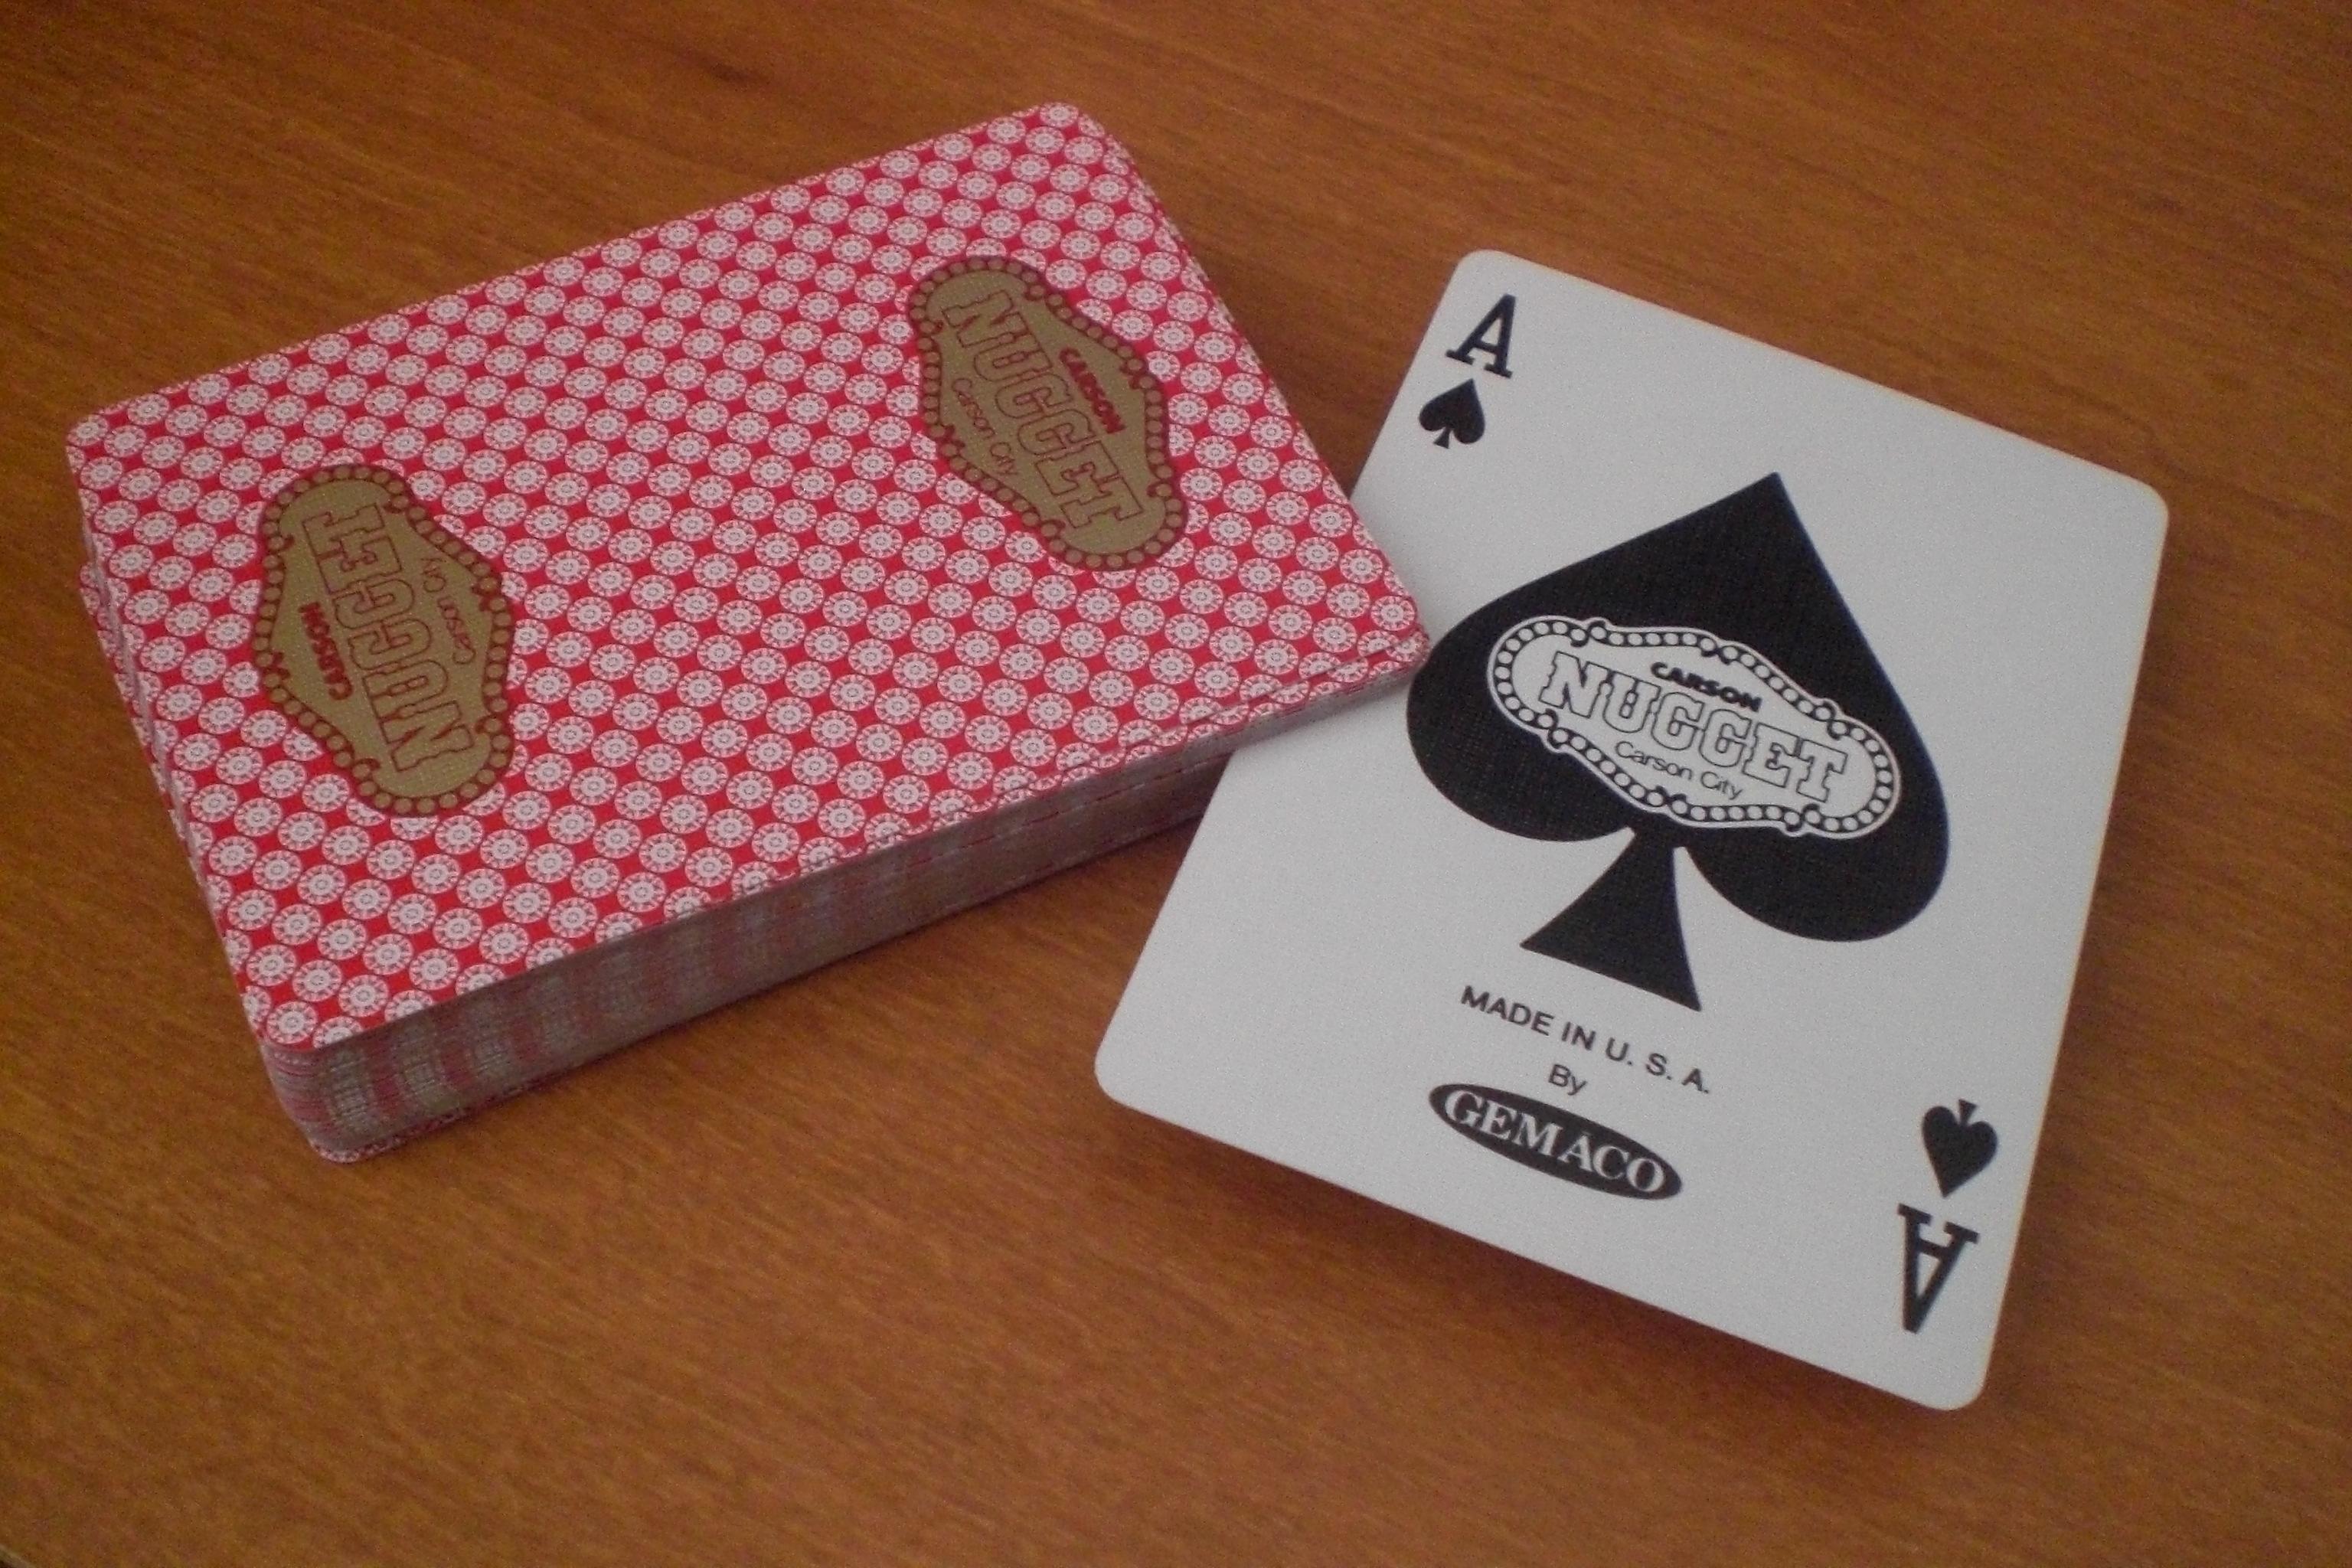 Gemaco Casino Deck